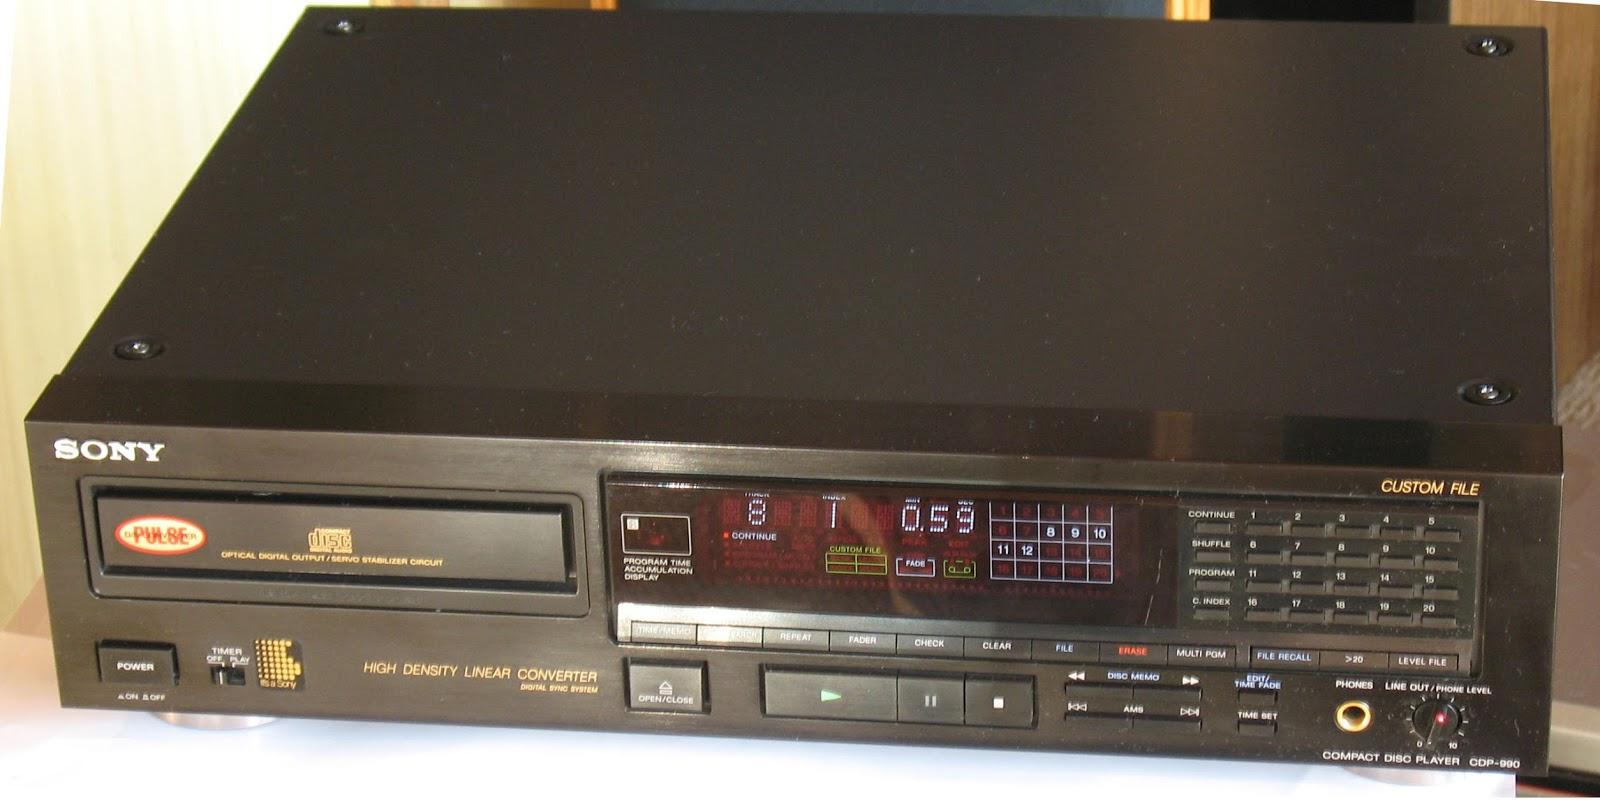 Sony CDP-990 - CD Player | AudioBaza